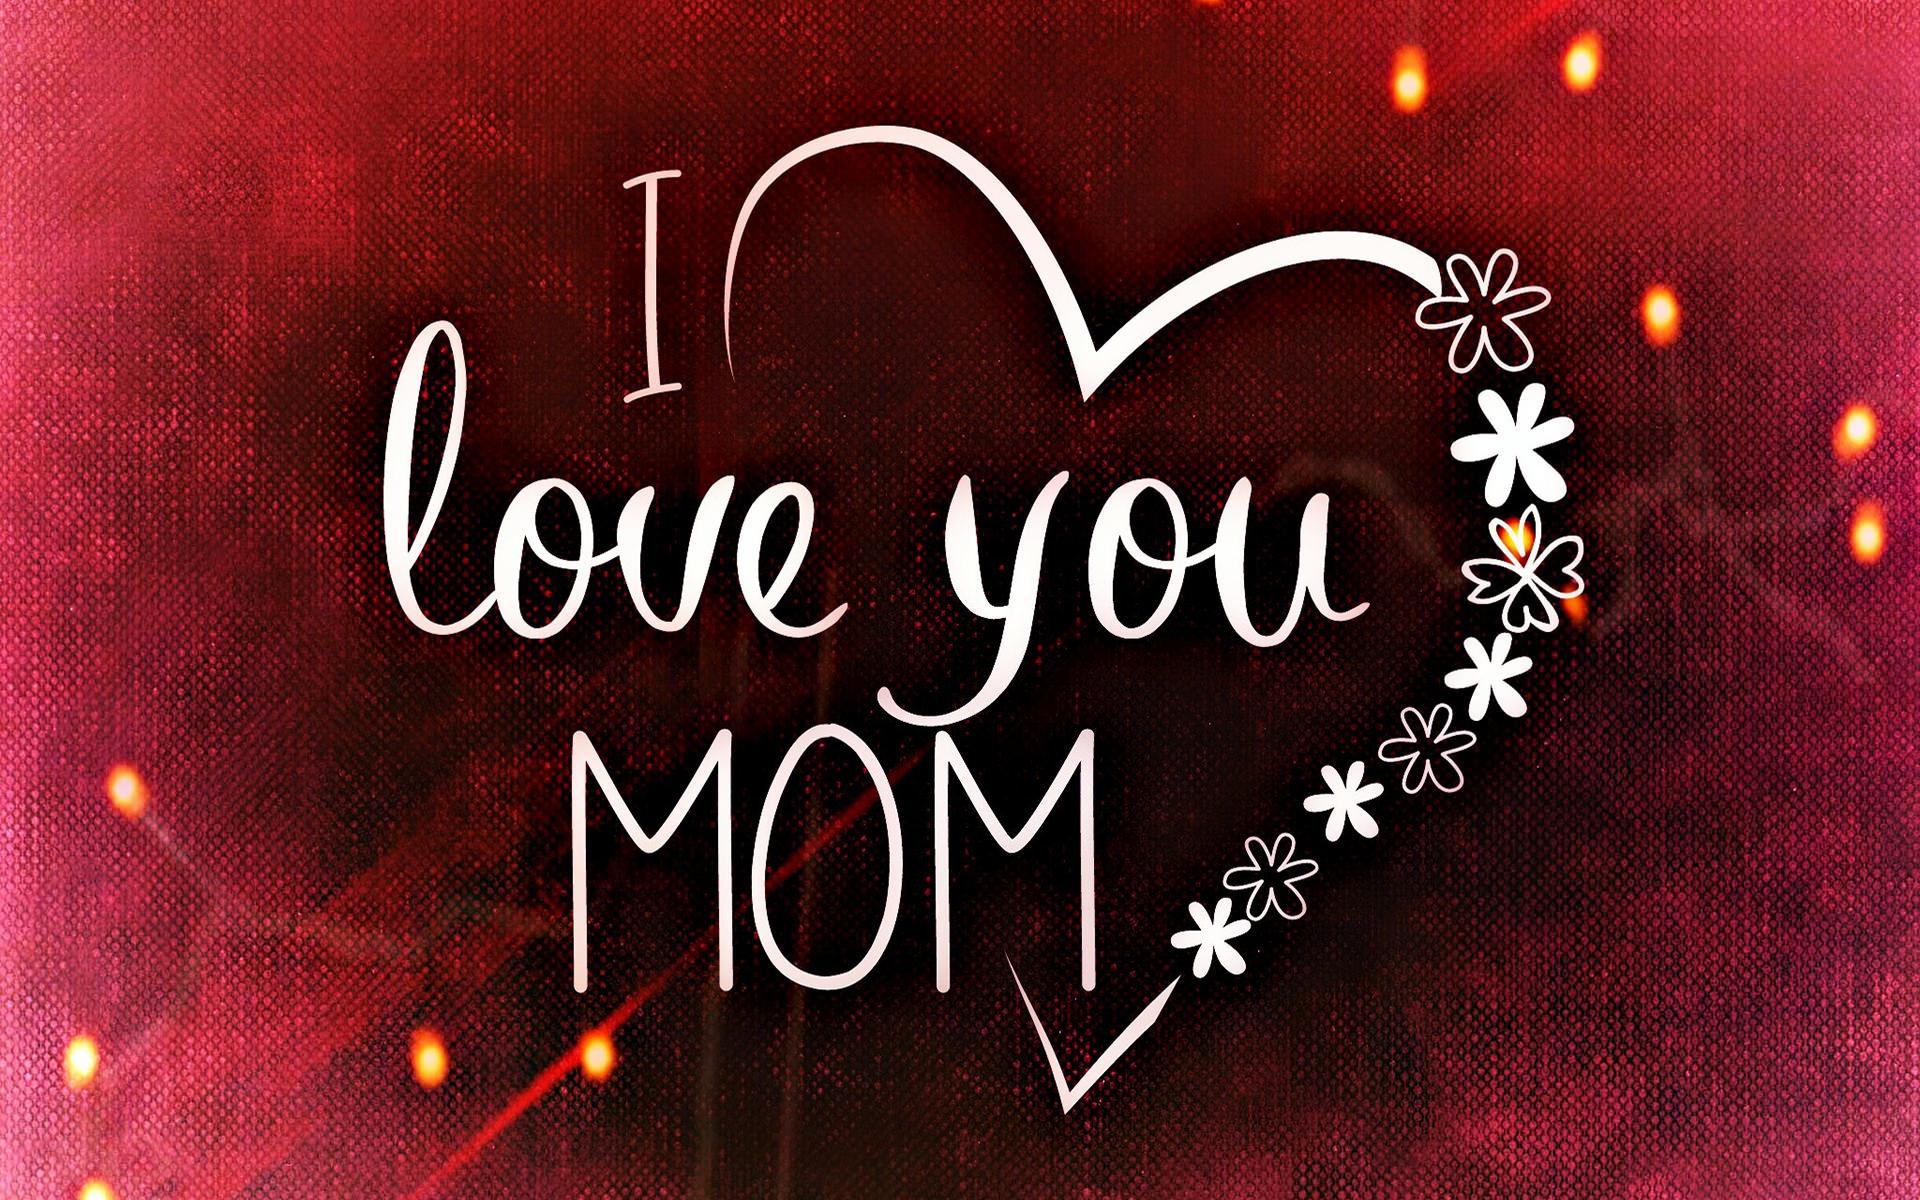 Wallpaper download hd love 2016 - I Love You Mom Wallpaper